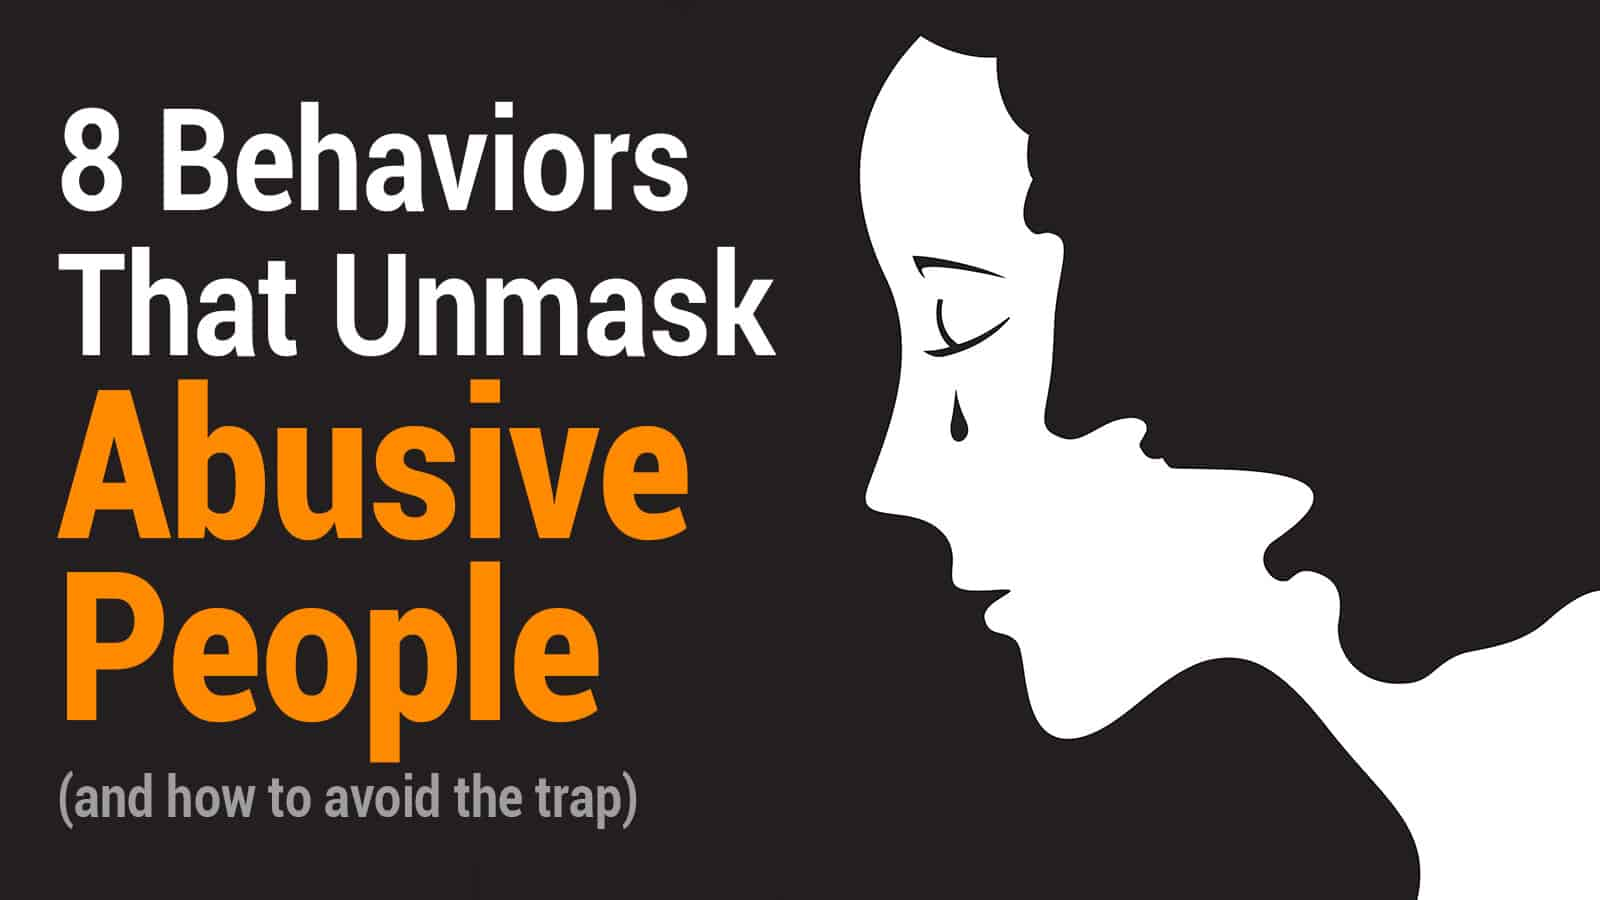 abusive people